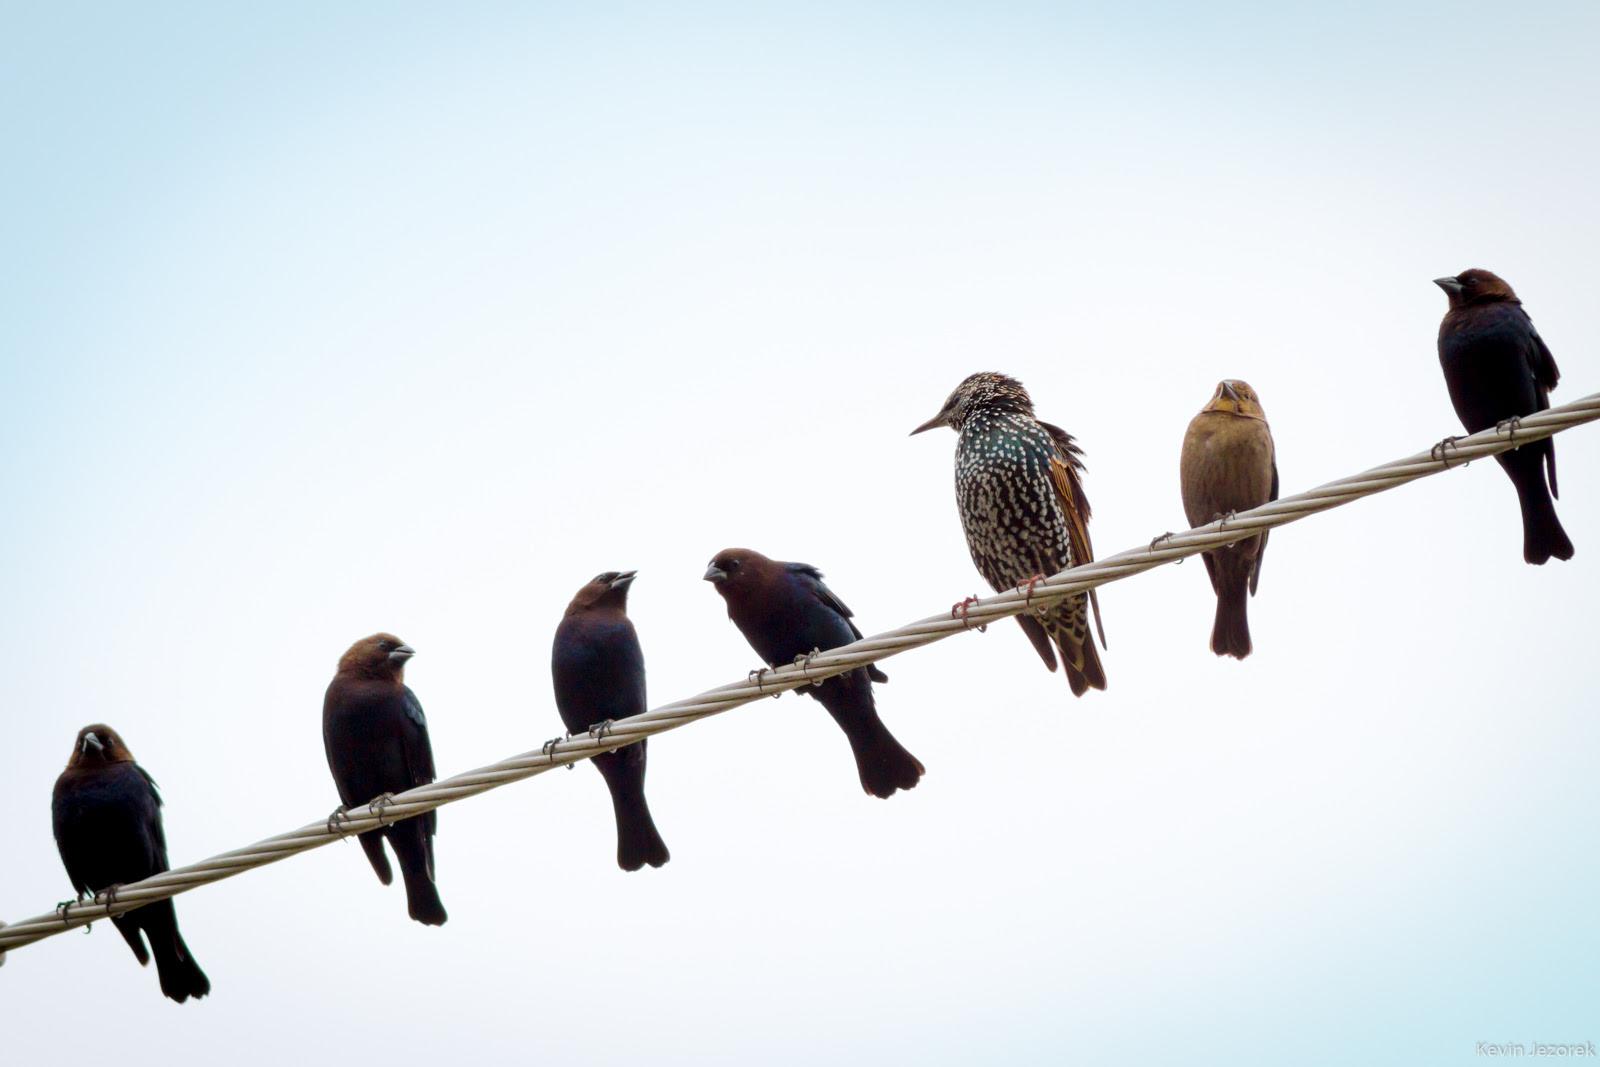 Birds On A Wire Kevin Jezorek Photography